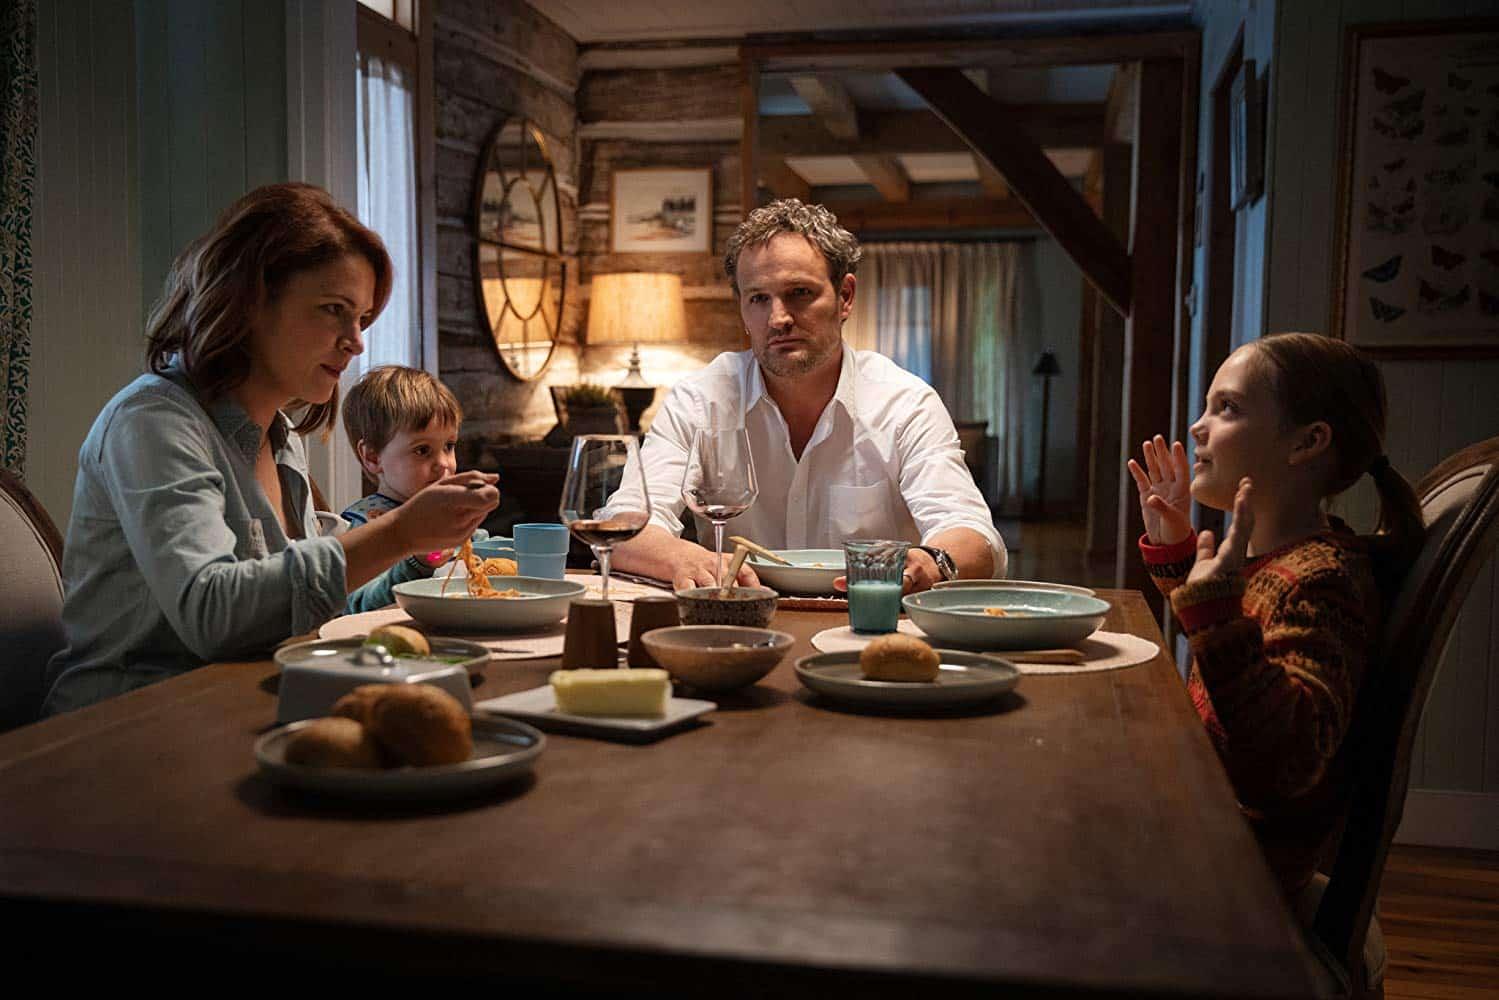 Semana en tráilers: Pet Sematary, Glass, Aladdin, Ben is Back, The Best of Enemies en Cine3